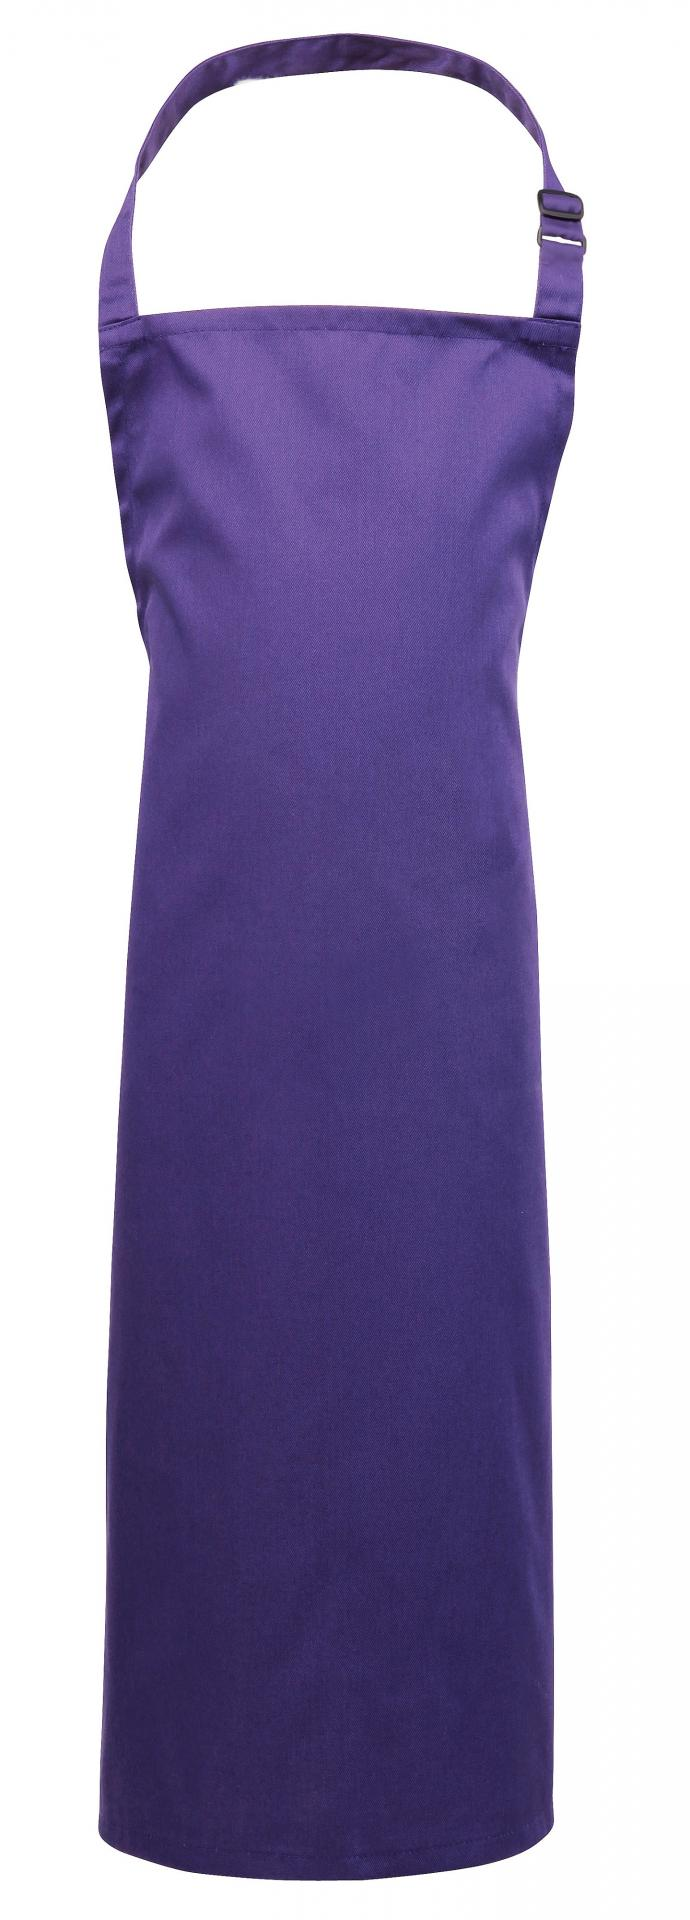 Pr149 purple ft